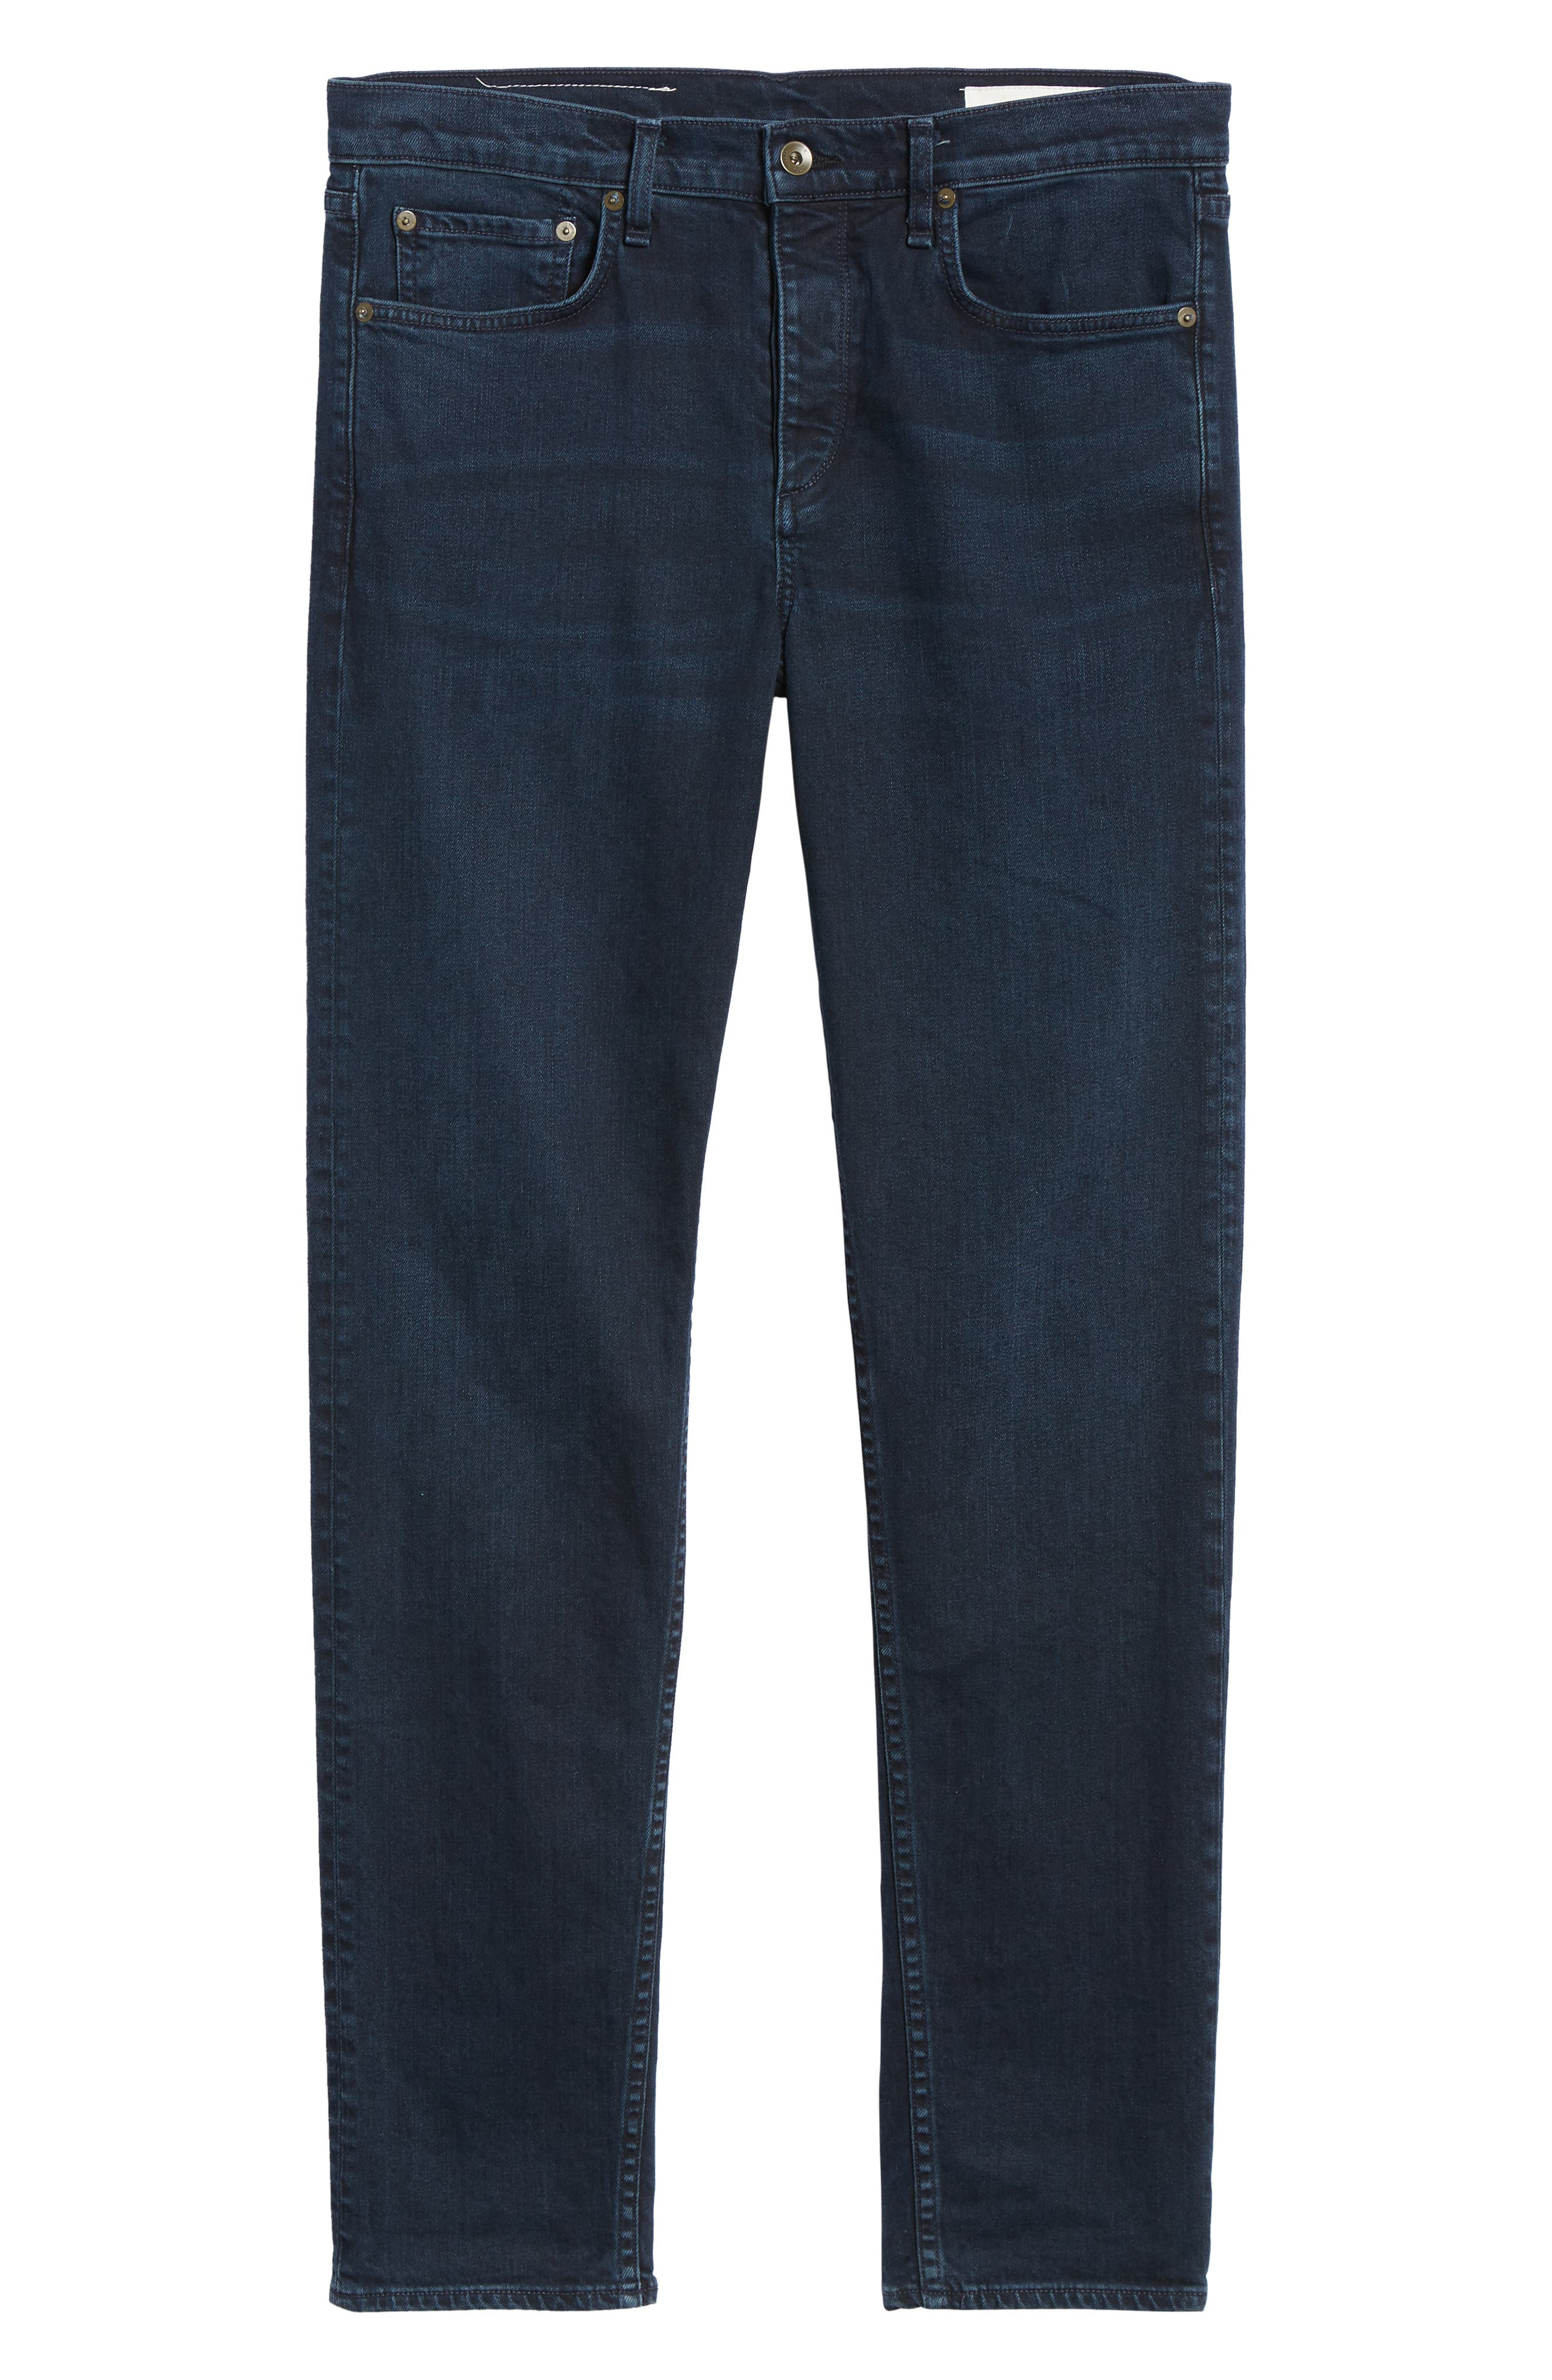 RAG & BONE, Fit 2 Slim Fit Jeans, Alternate thumbnail 7, color, BAYVIEW